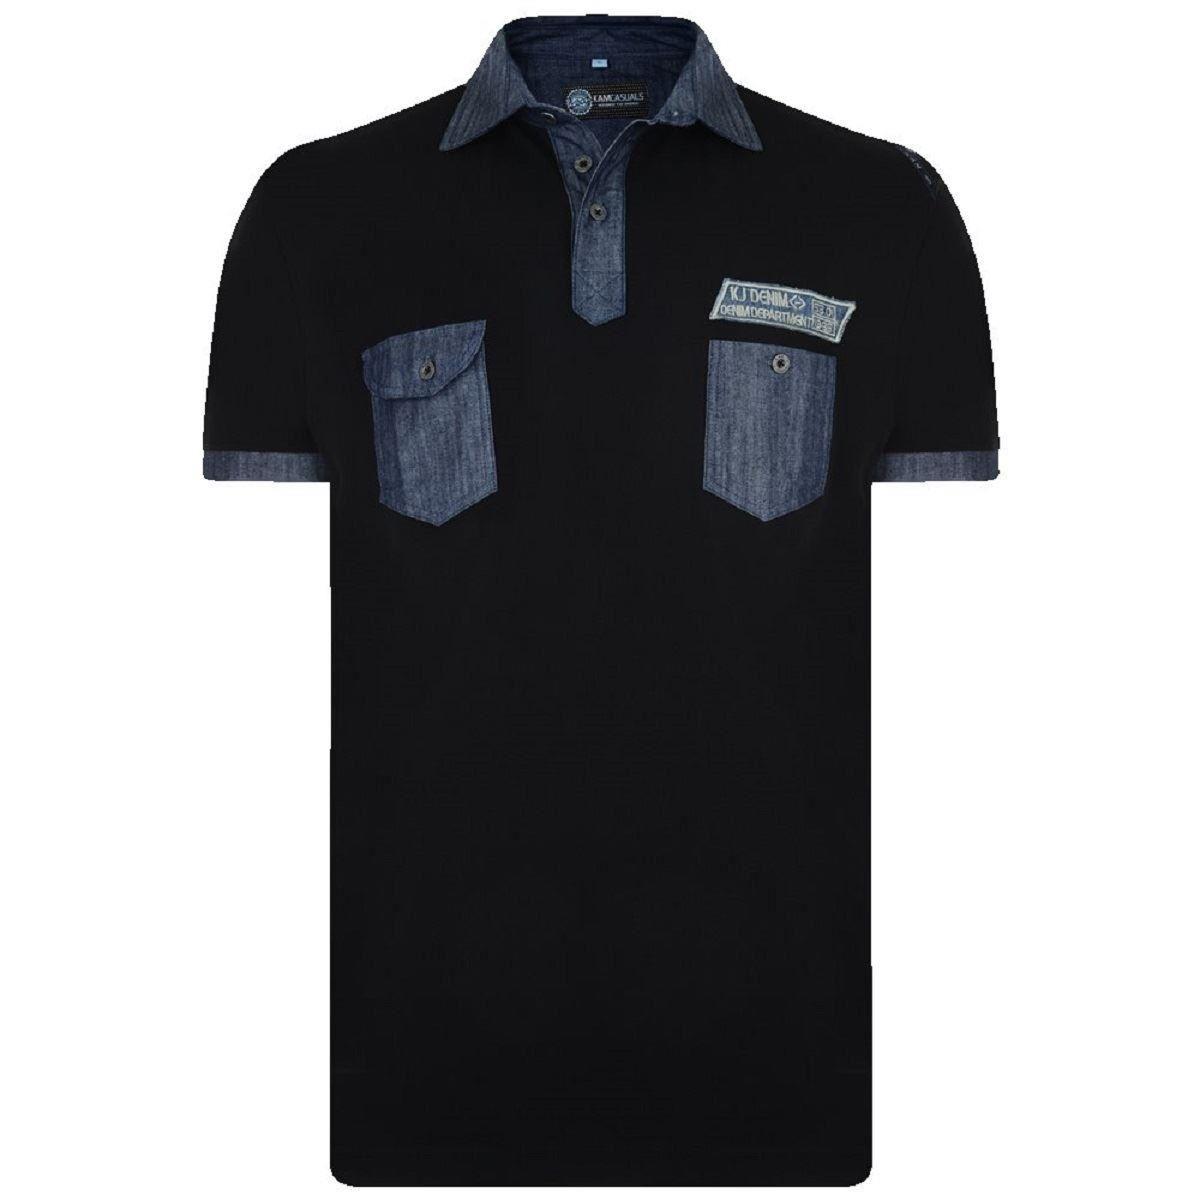 Big mens king size shirt polo neck t shirt tee size 2xl for Mens 2xl tall shirts